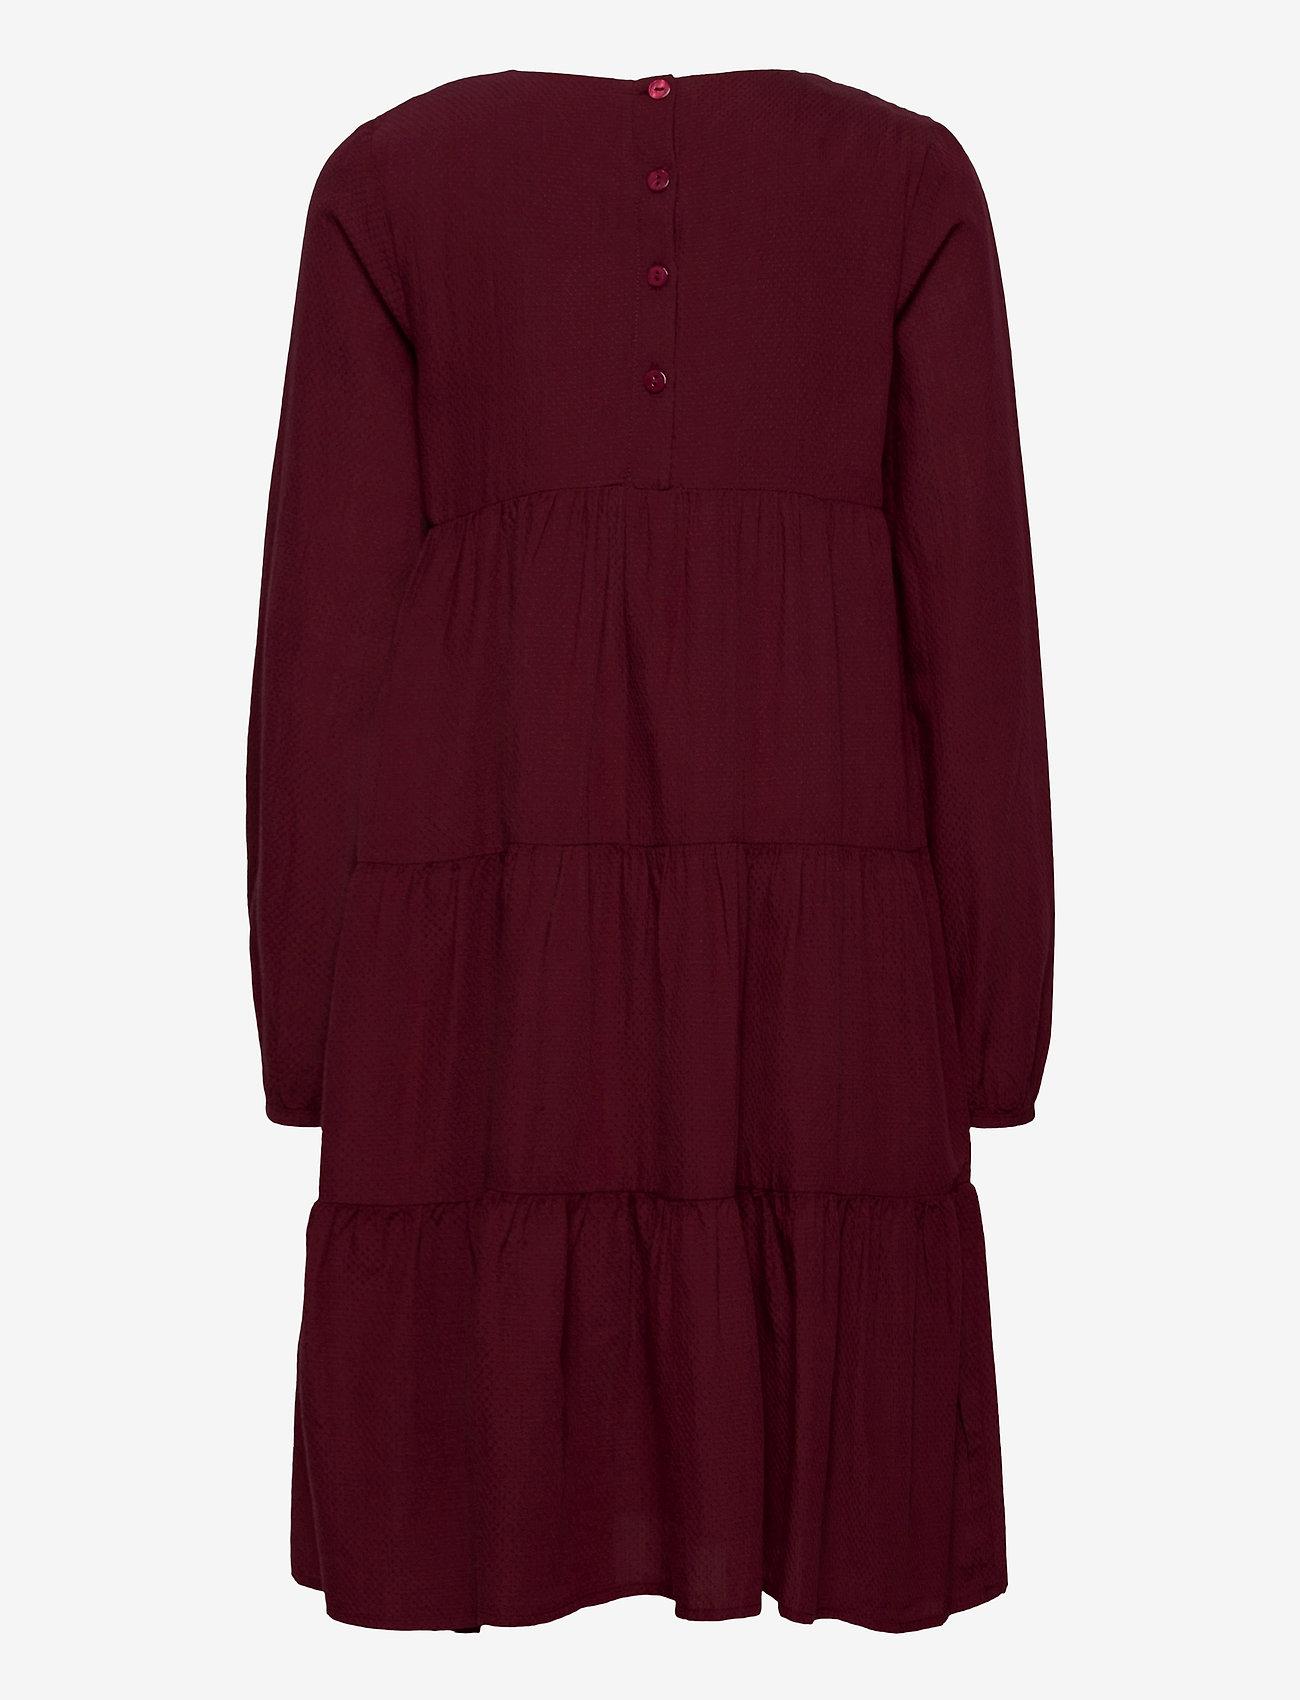 Wheat - Dress Fanny - burgundy - 1